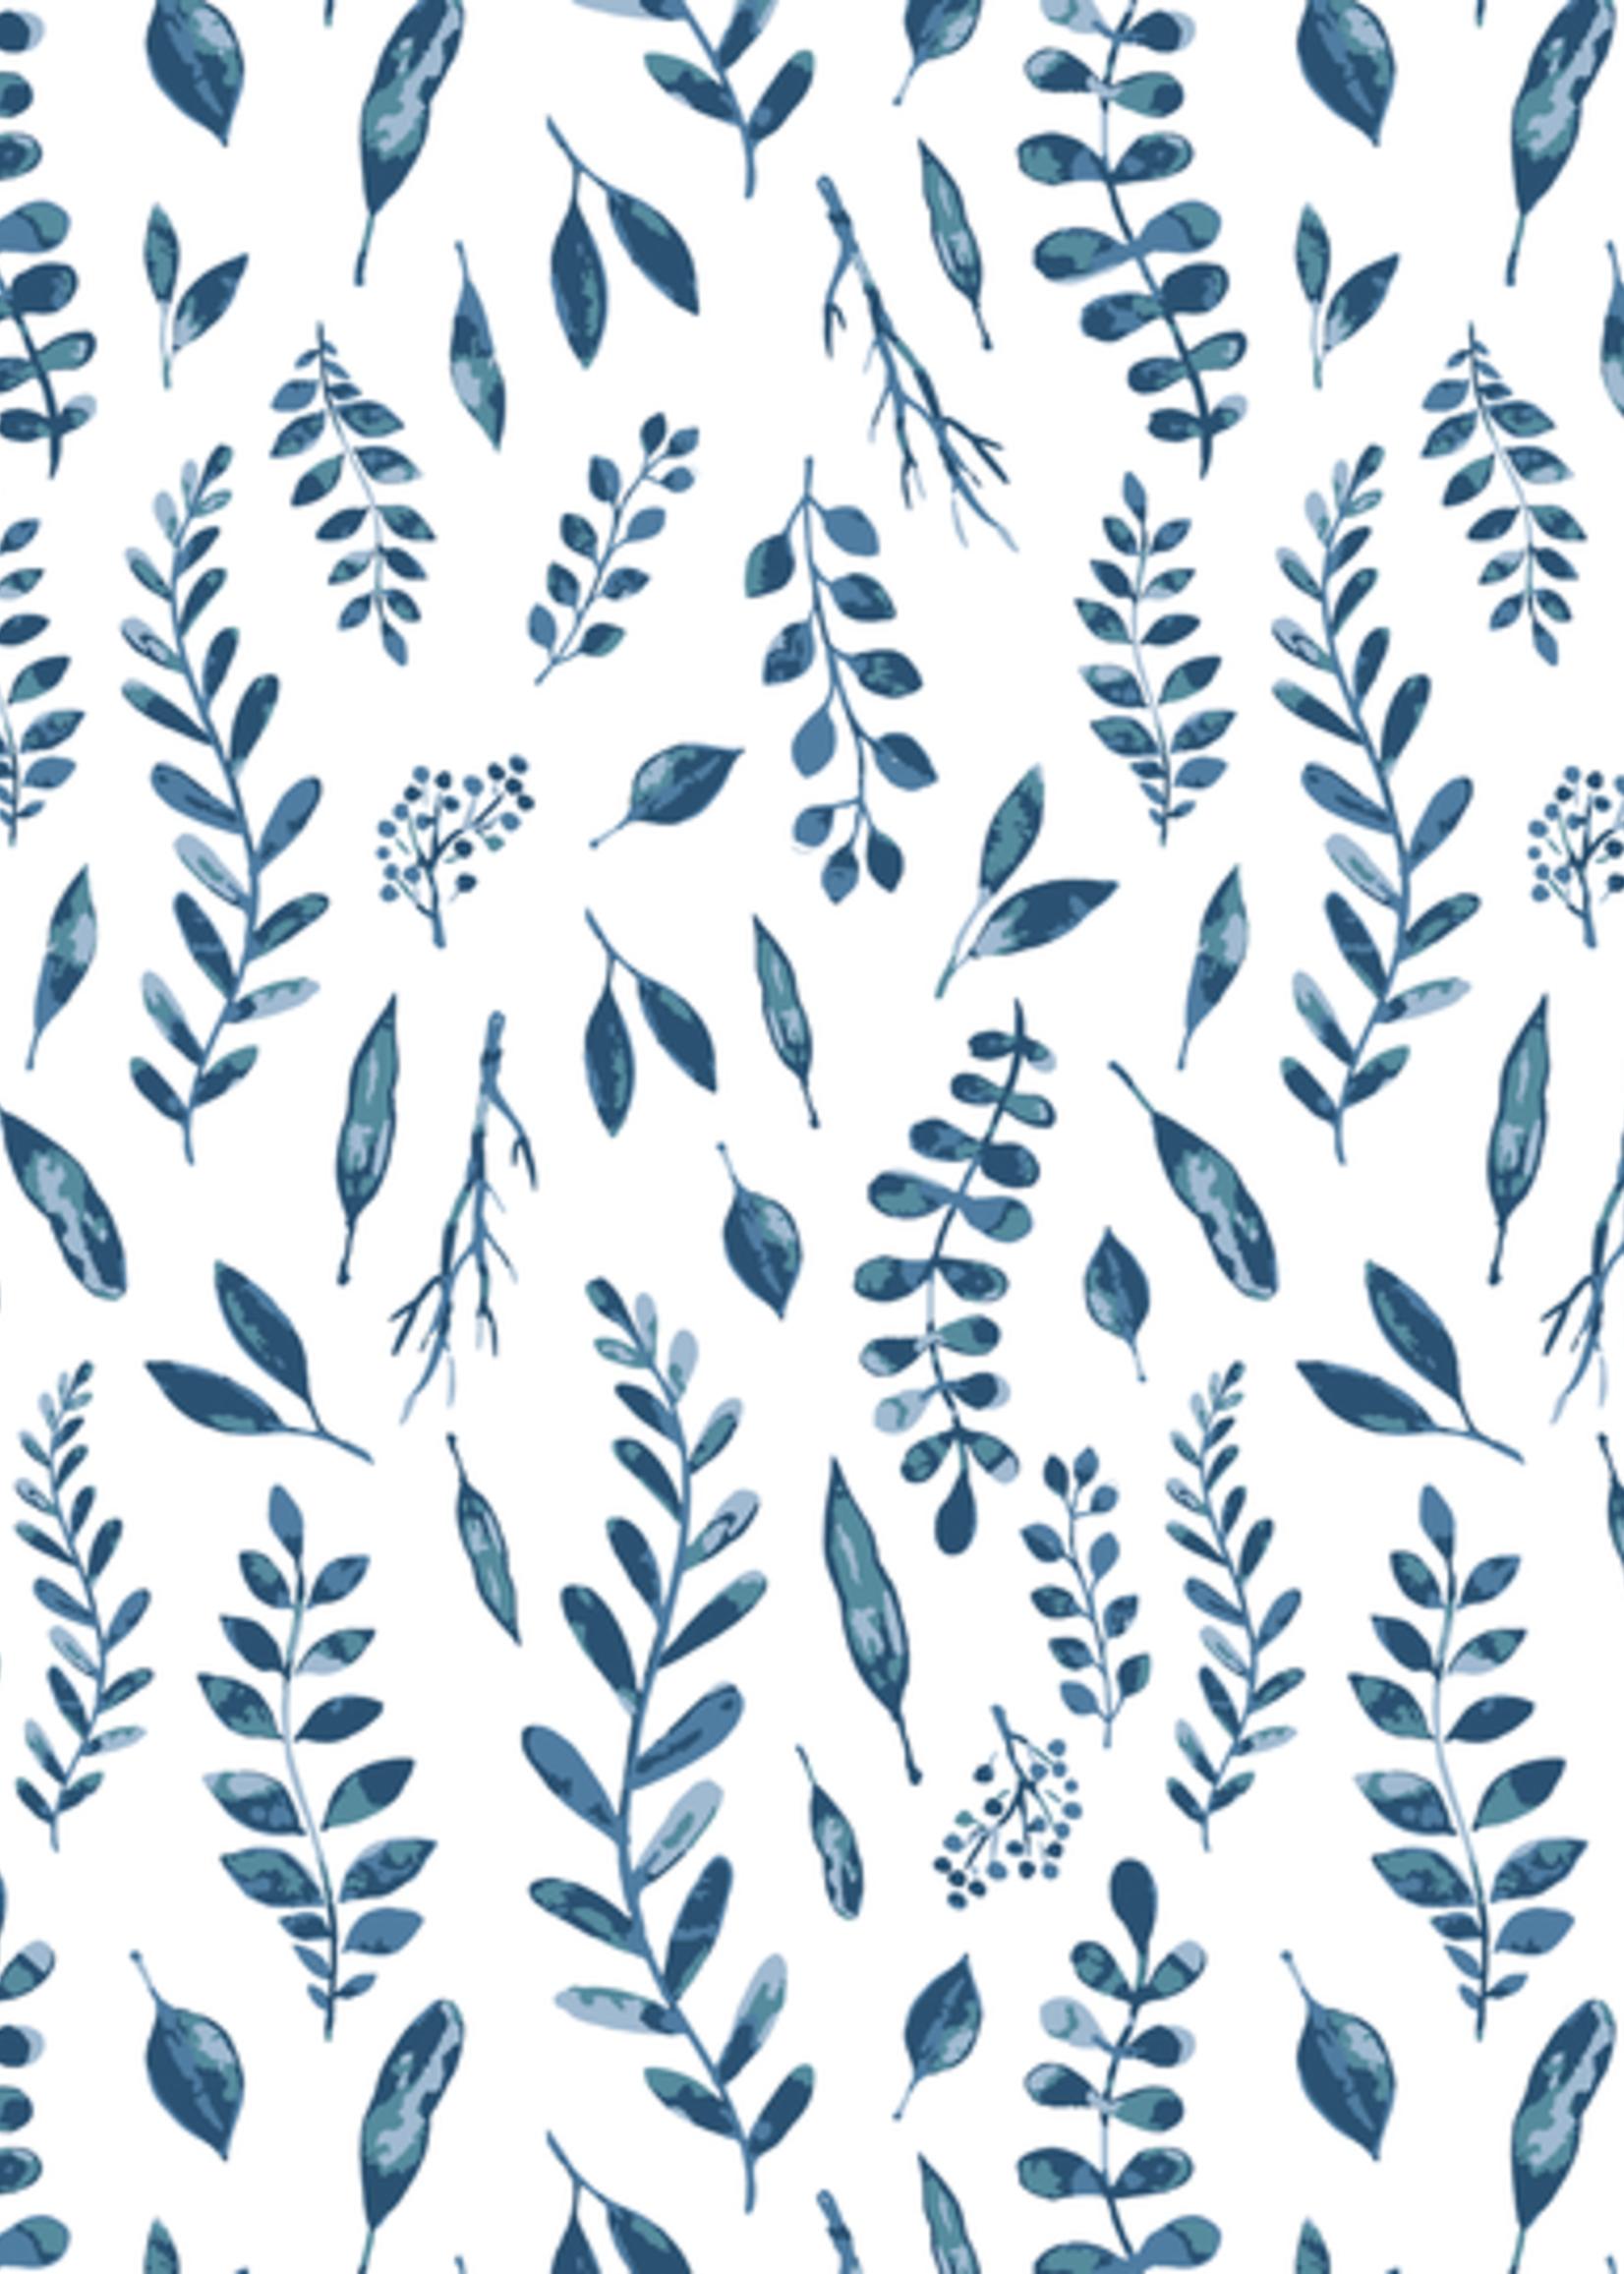 Bebe Au Lait Blue Leaves Cotton Muslin Bandana Bib